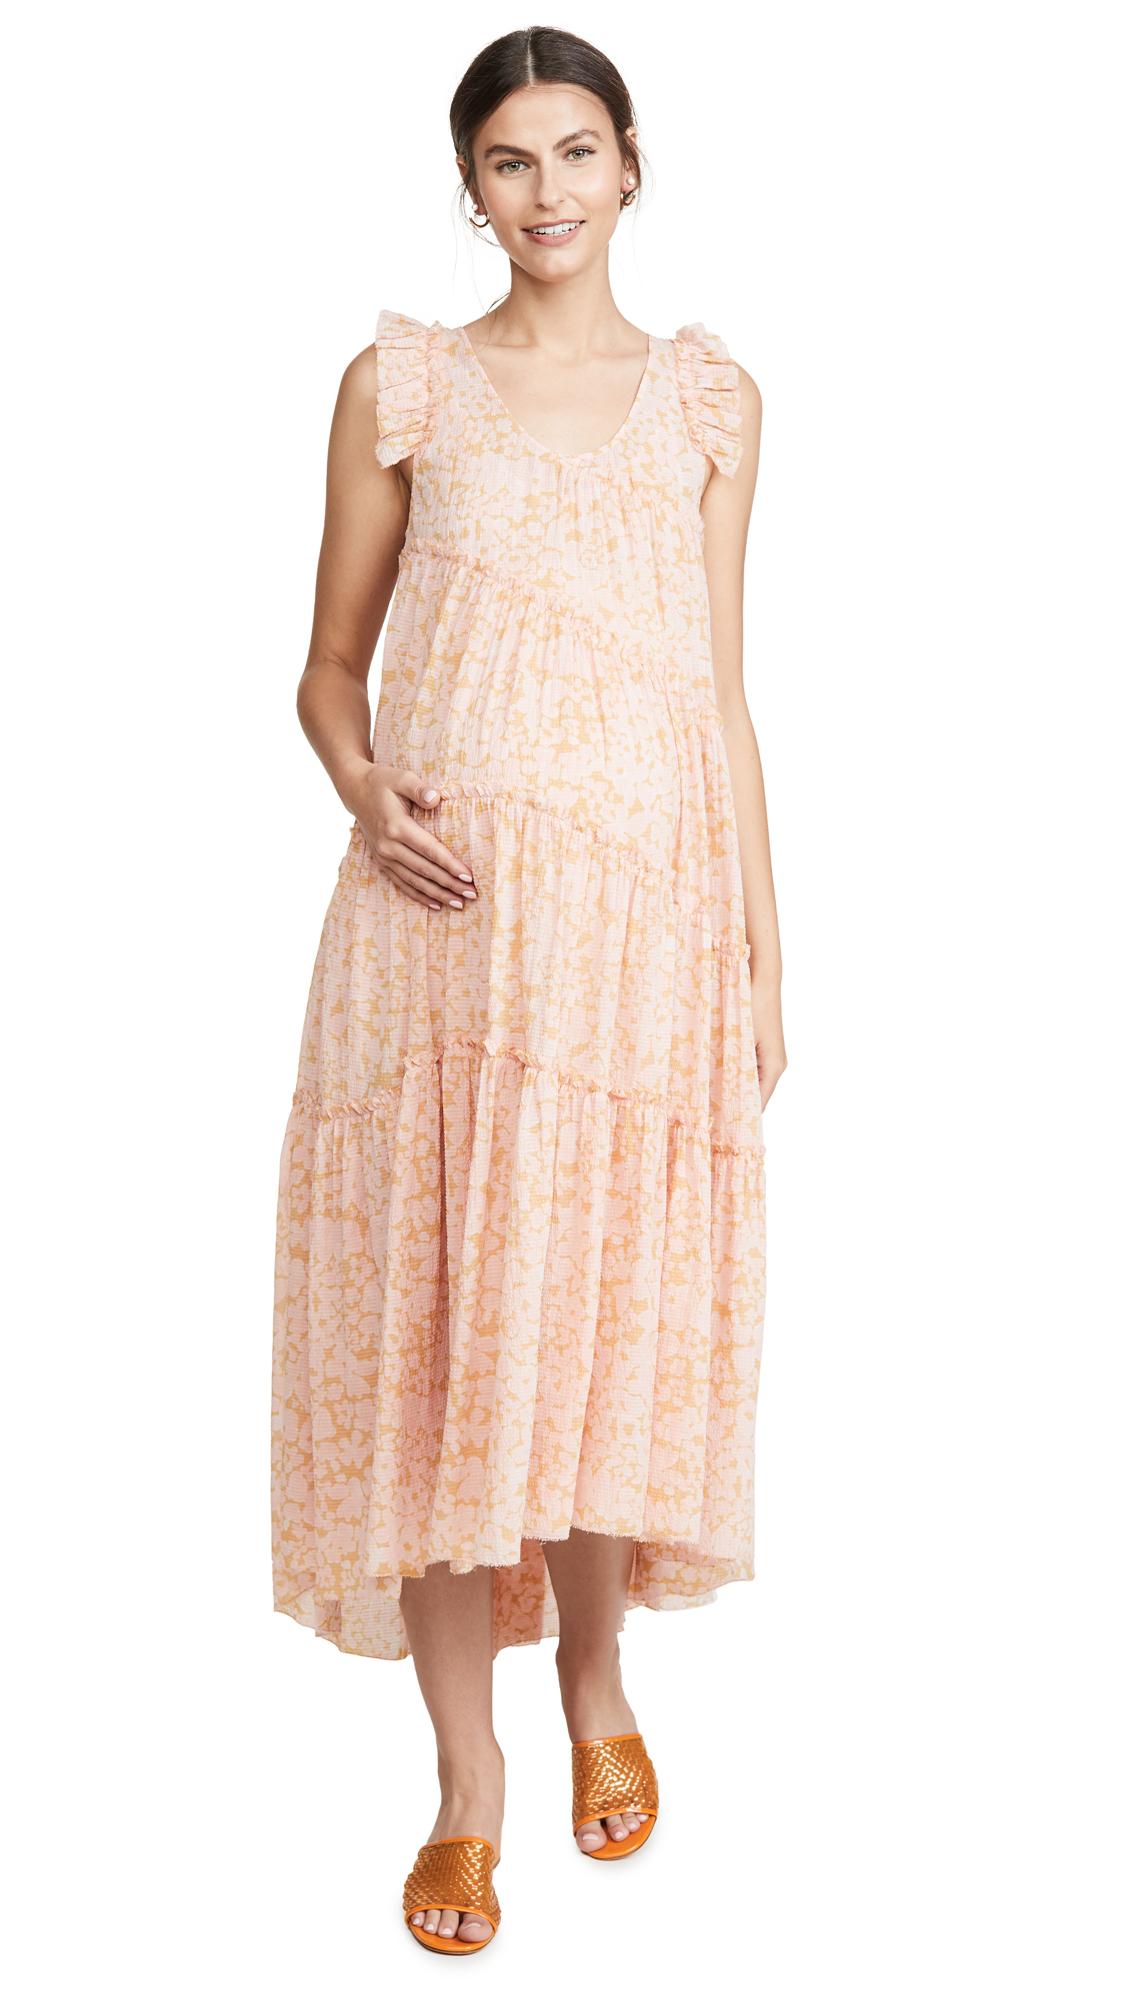 Photo of HATCH The Anaelle Dress - shop HATCH Clothing, Dresses online